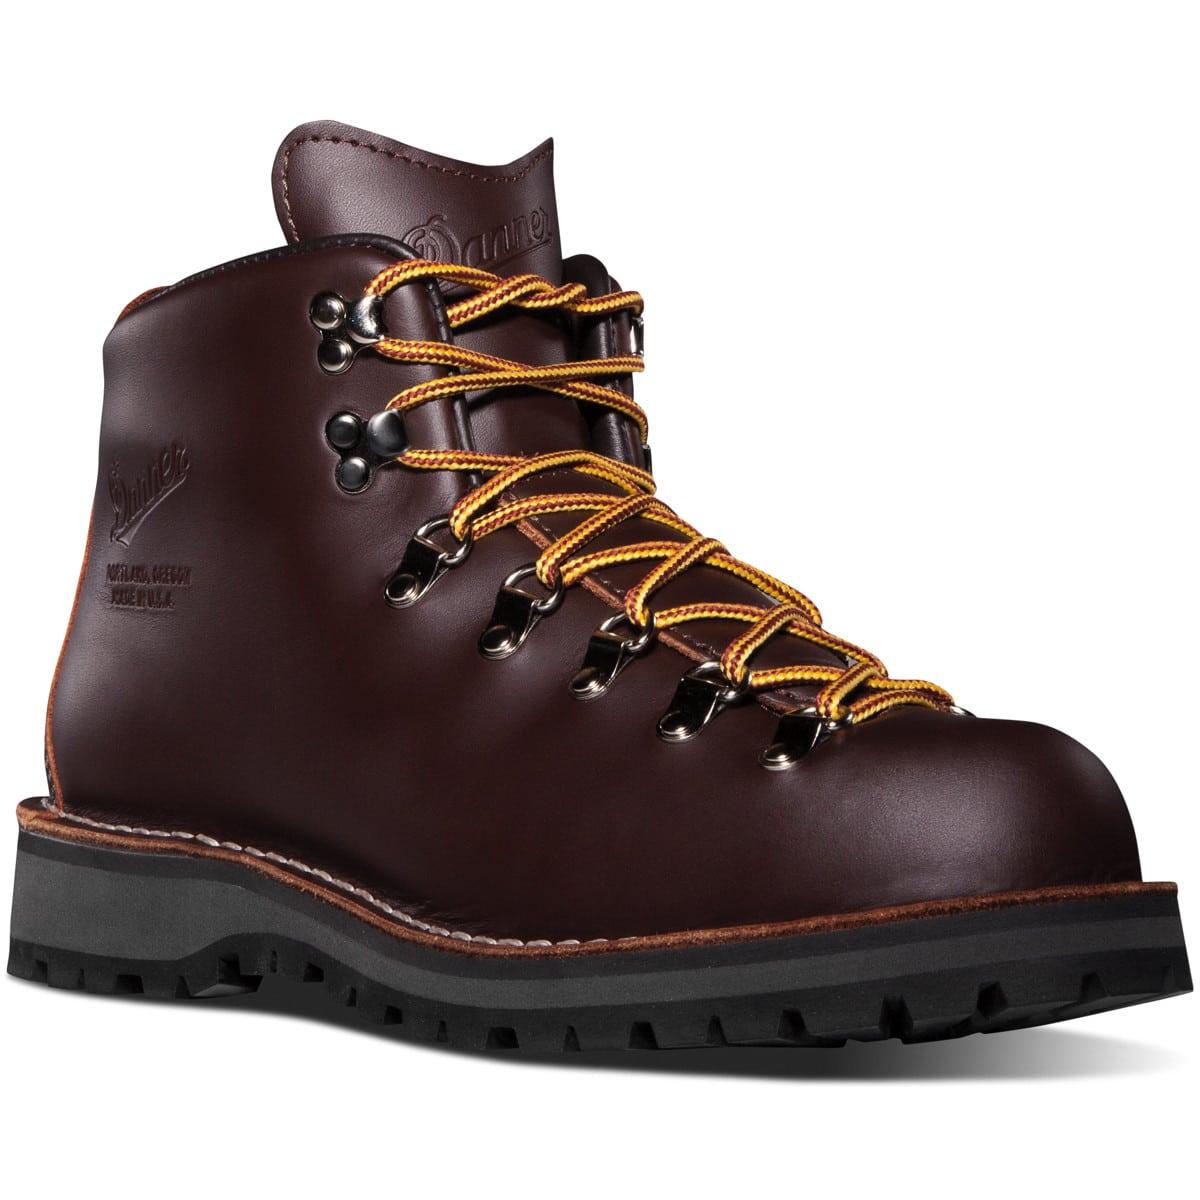 mountain light hiking boots danner